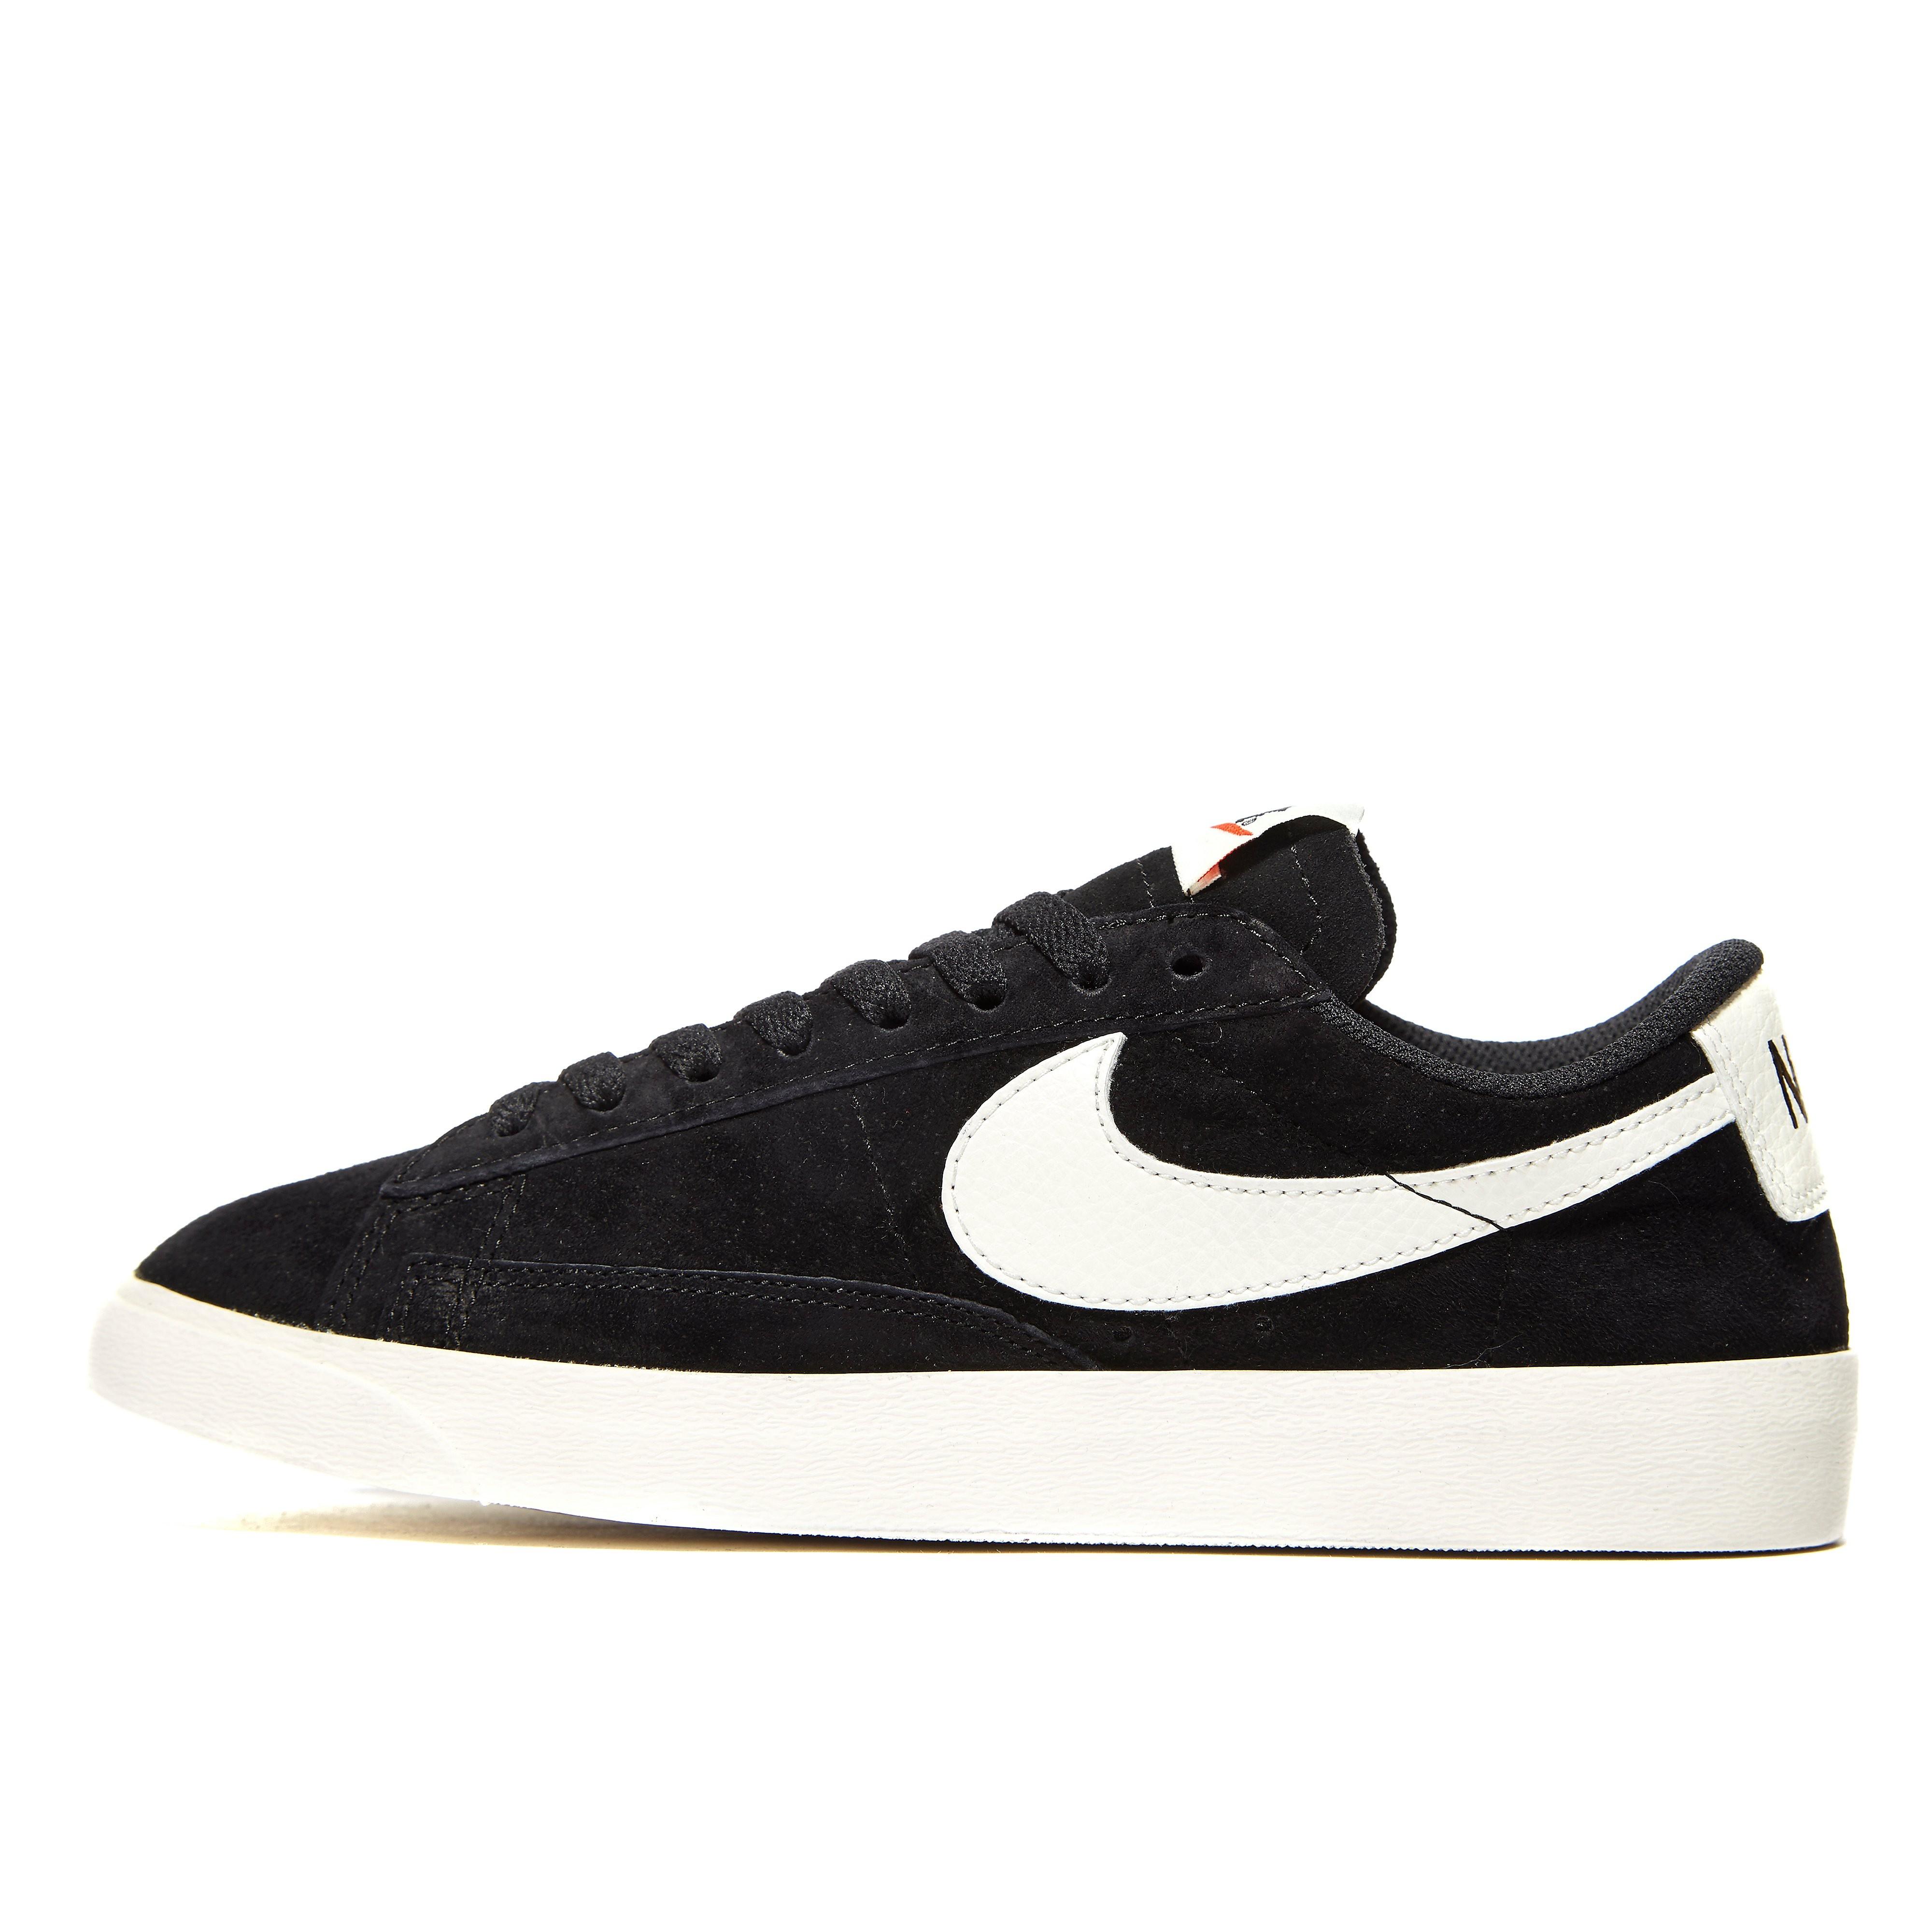 Nike Blazer Low Suede Women's